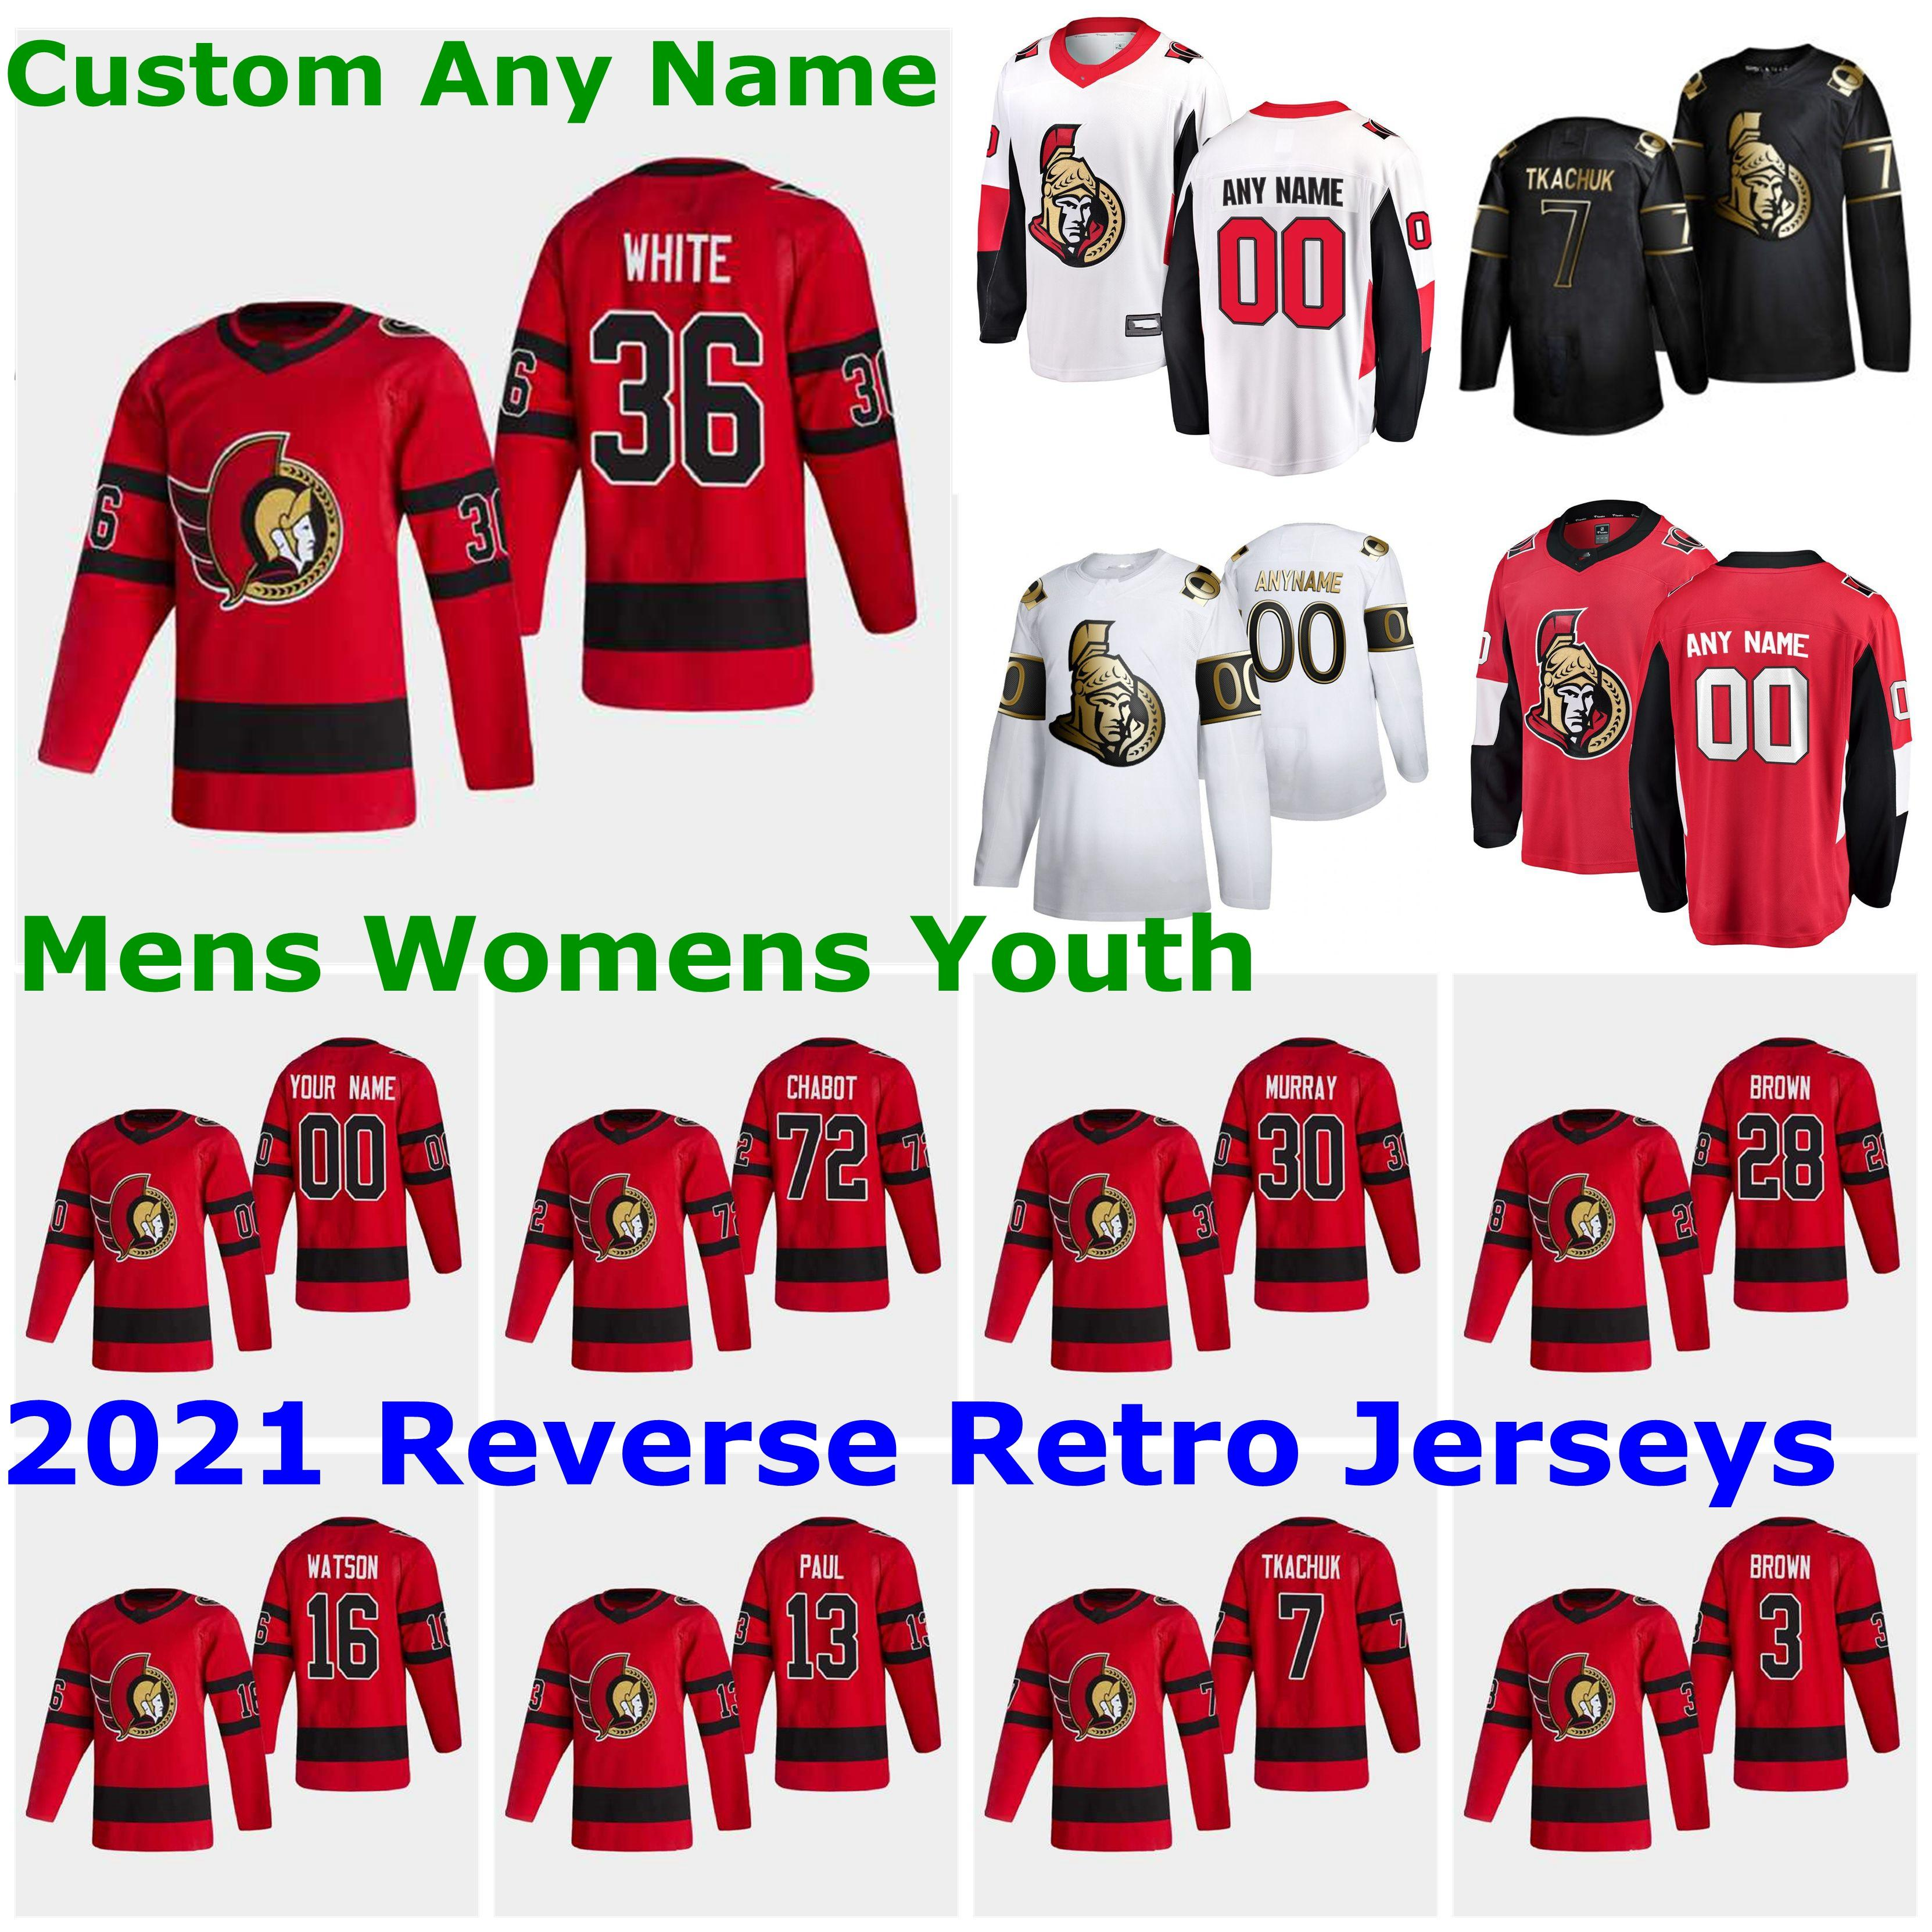 Ottawa Senators 2021 Reverse Retro Jerseys 28 Connor Brown Jersey 21 Logan Brown 10 Anthony Duclair 63 Tyler Ennis Mens Custom Stitched